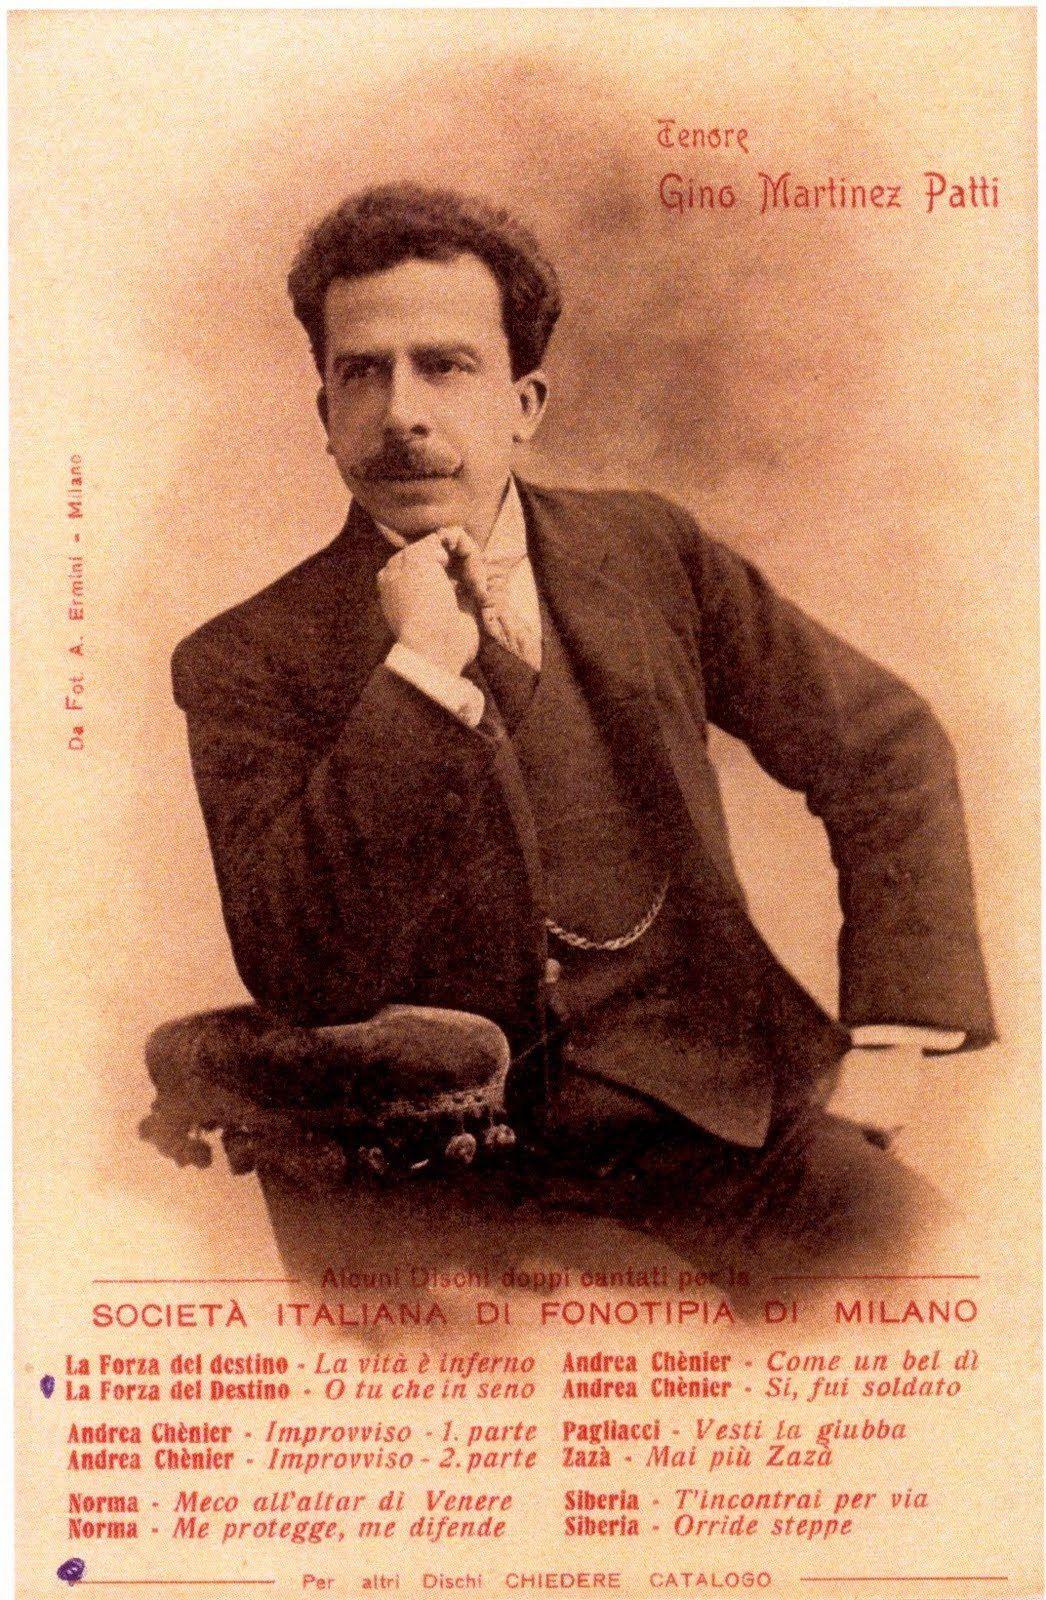 ITALIAN TENOR GINO MARTINEZ-PATTI (1866 - 1925) CD